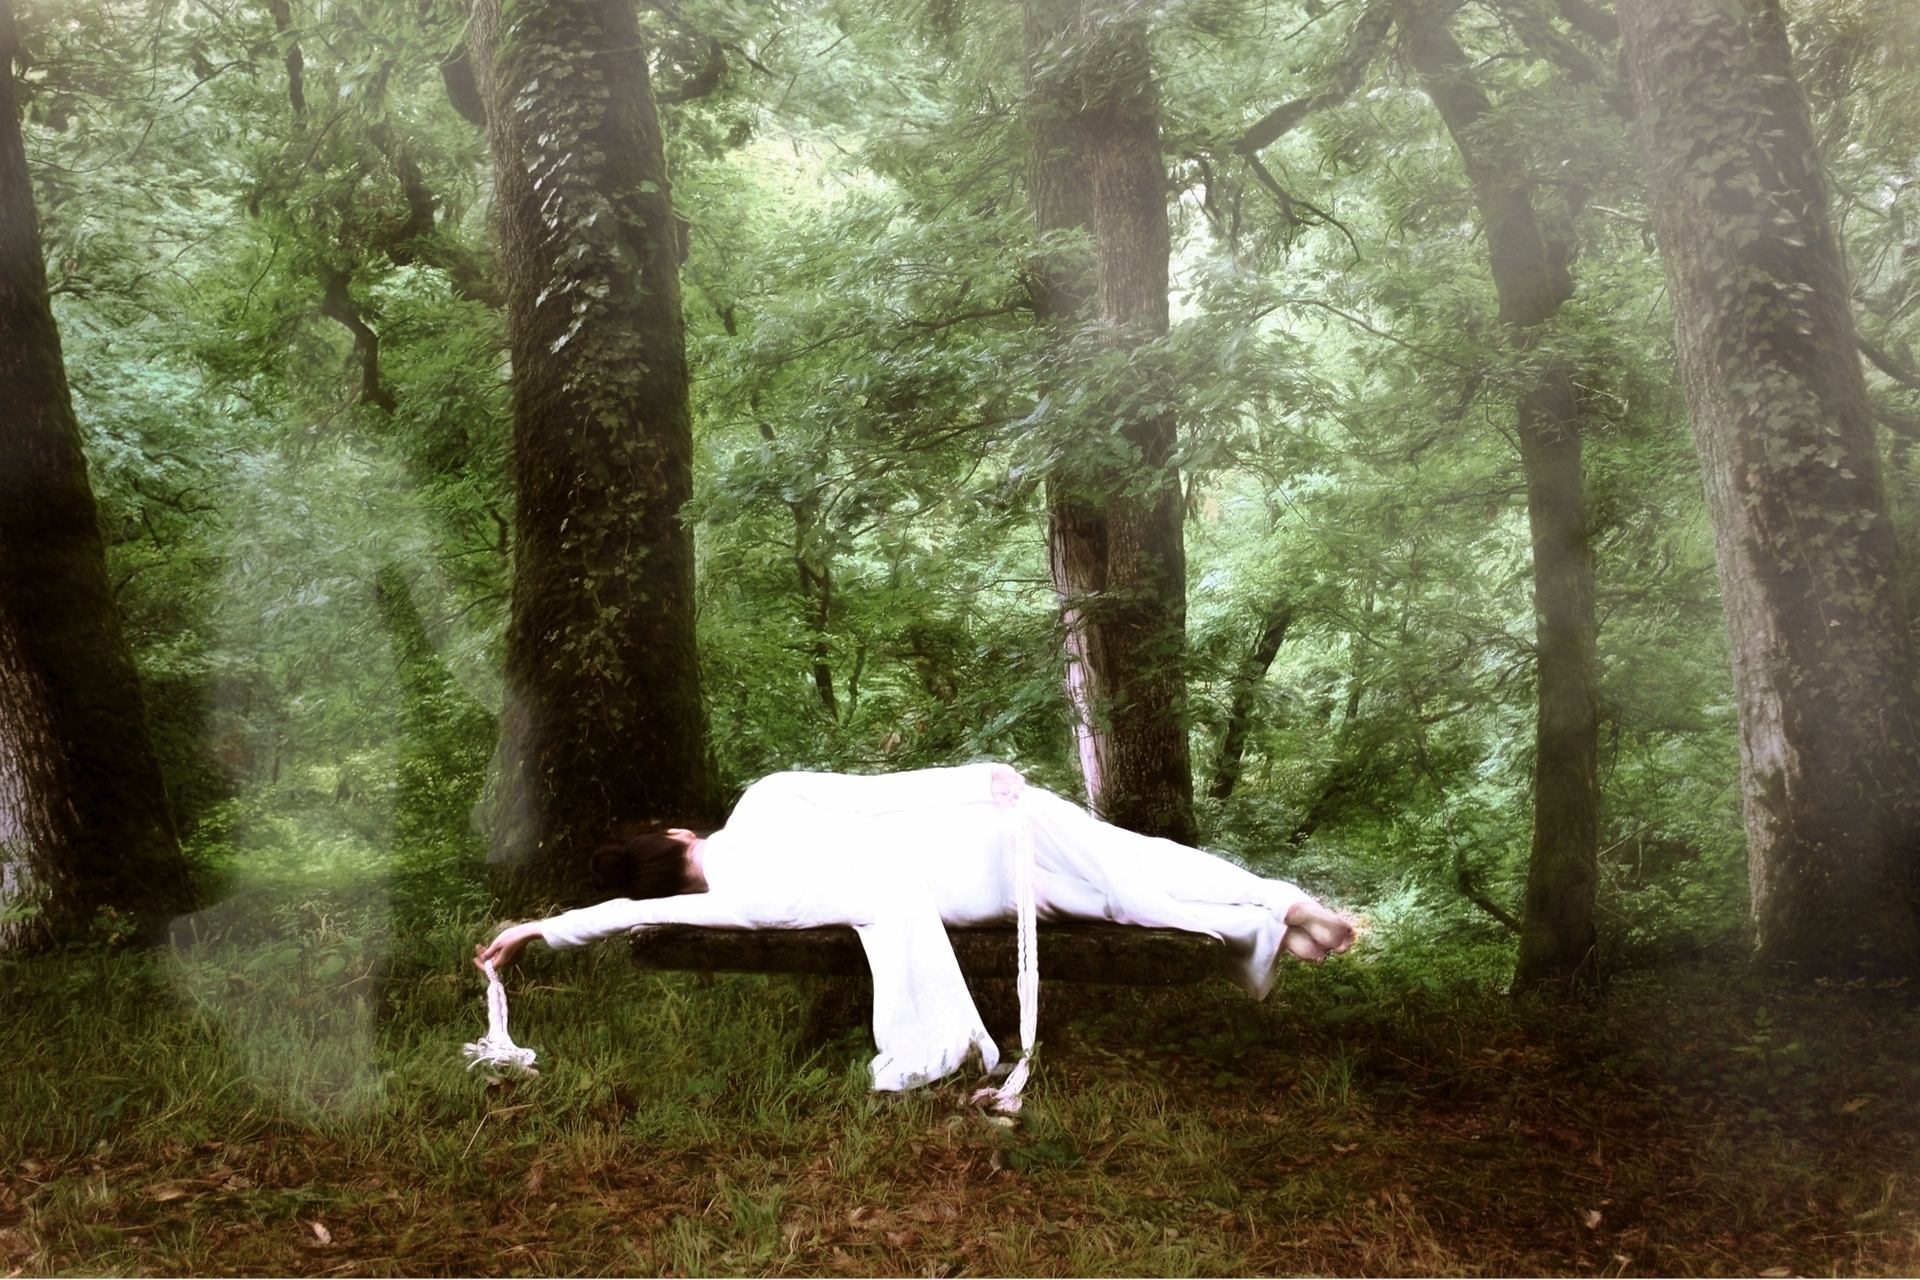 #6_Un rêve brisé sur un hamac endormi